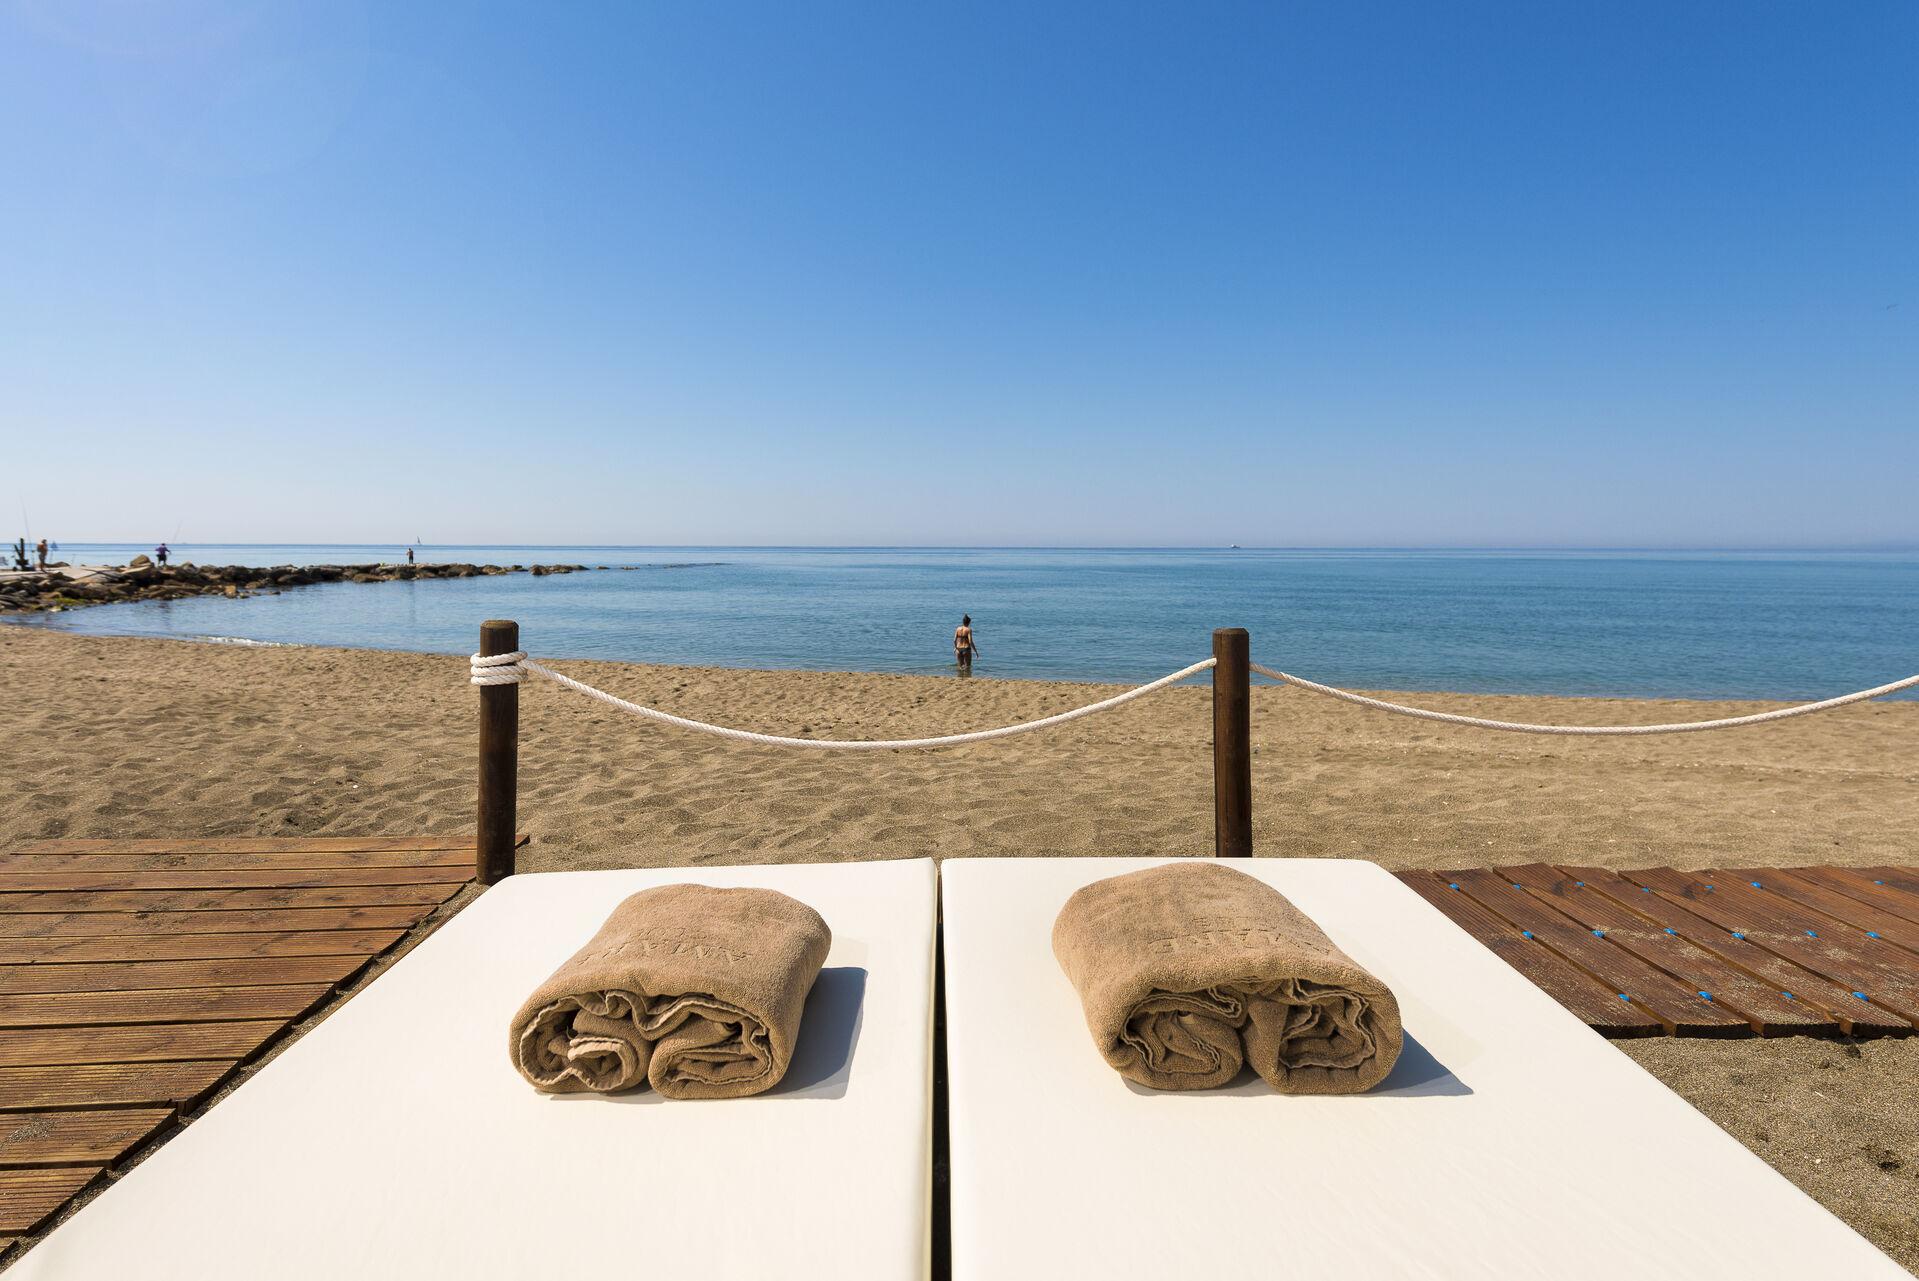 https://cms.satur.sk/data/imgs/tour_image/orig/amare-marbella-beach-camas-3-1972169.jpg